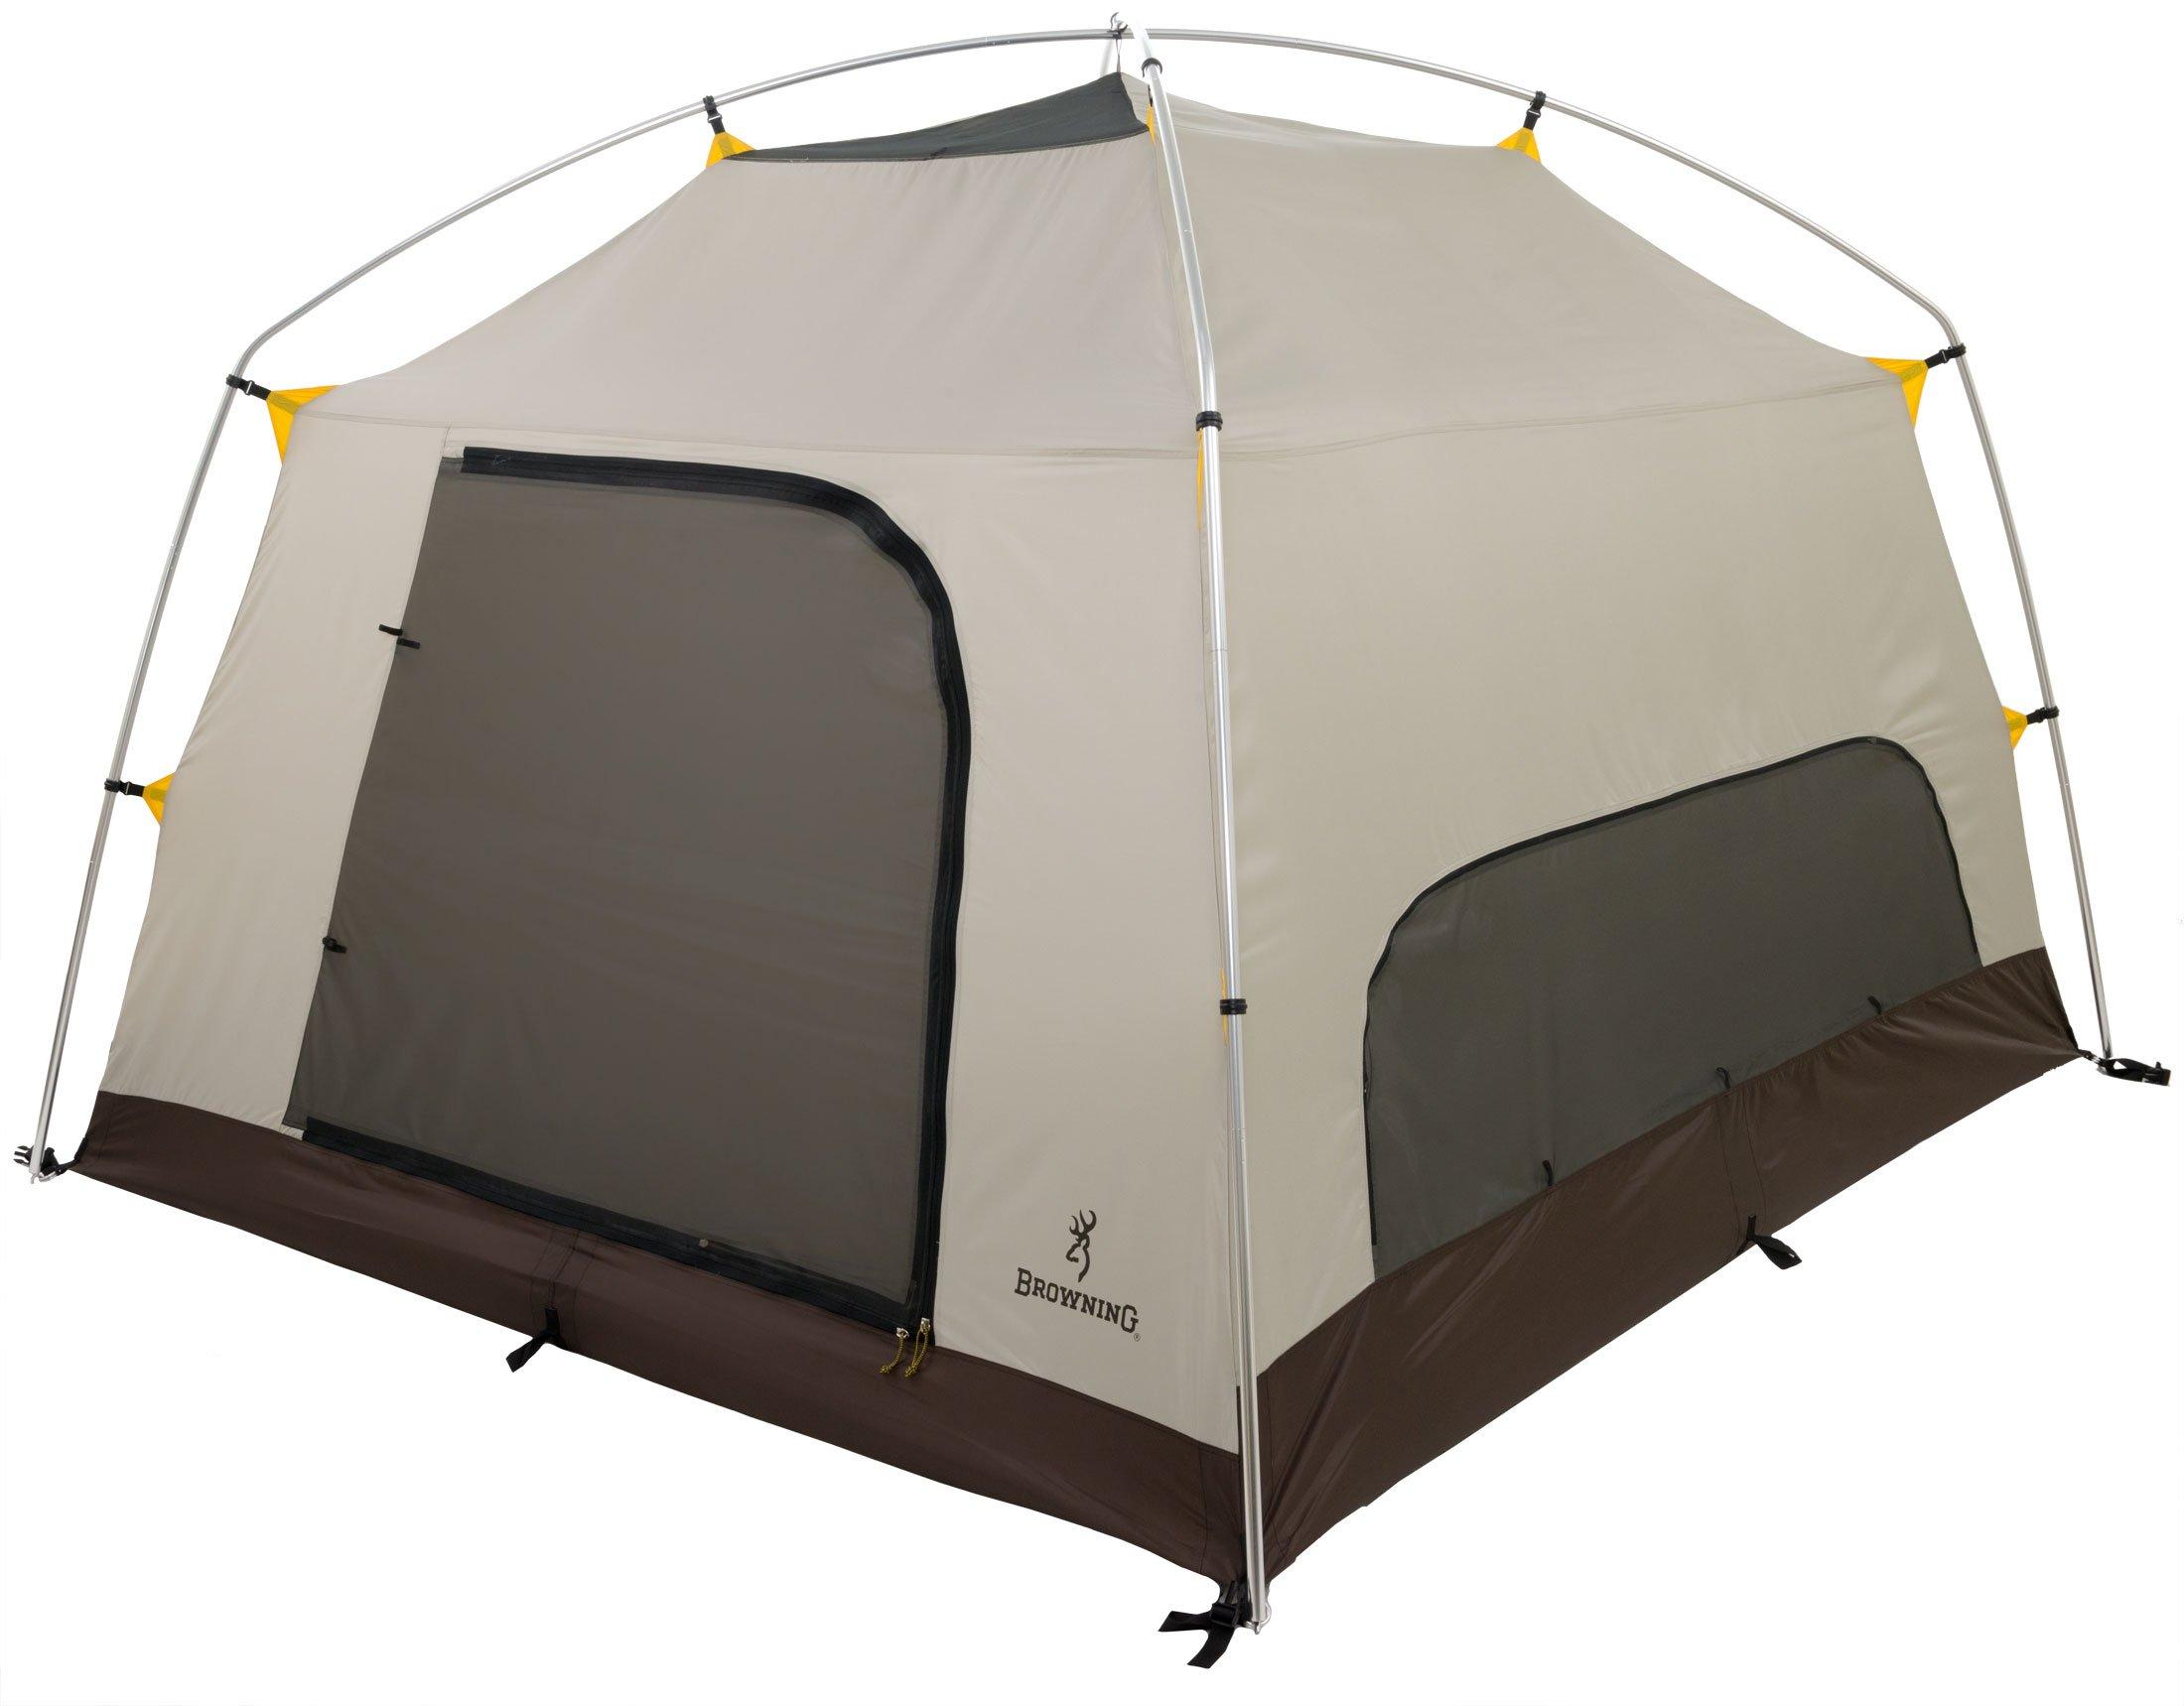 Browning Camping Glacier Tent